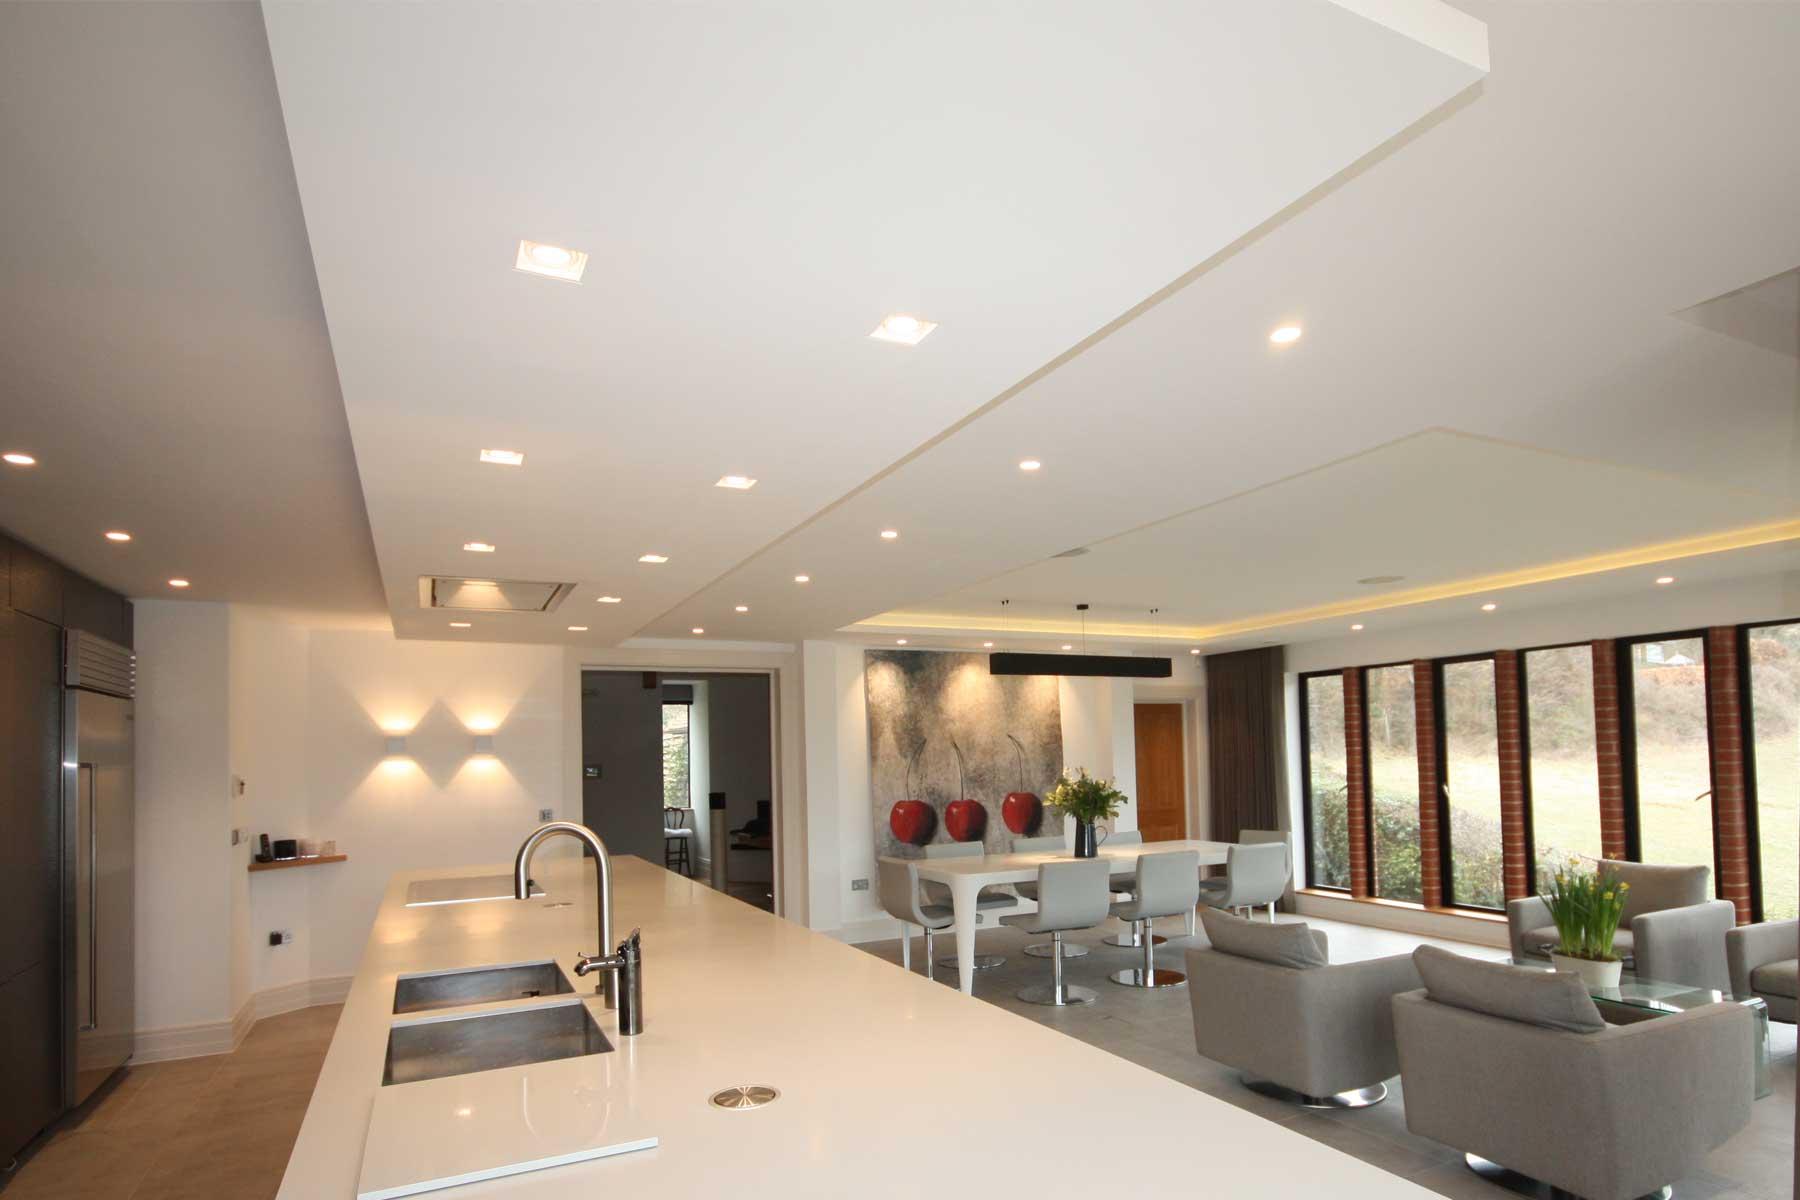 Commercial residential lighting design london sussex kent